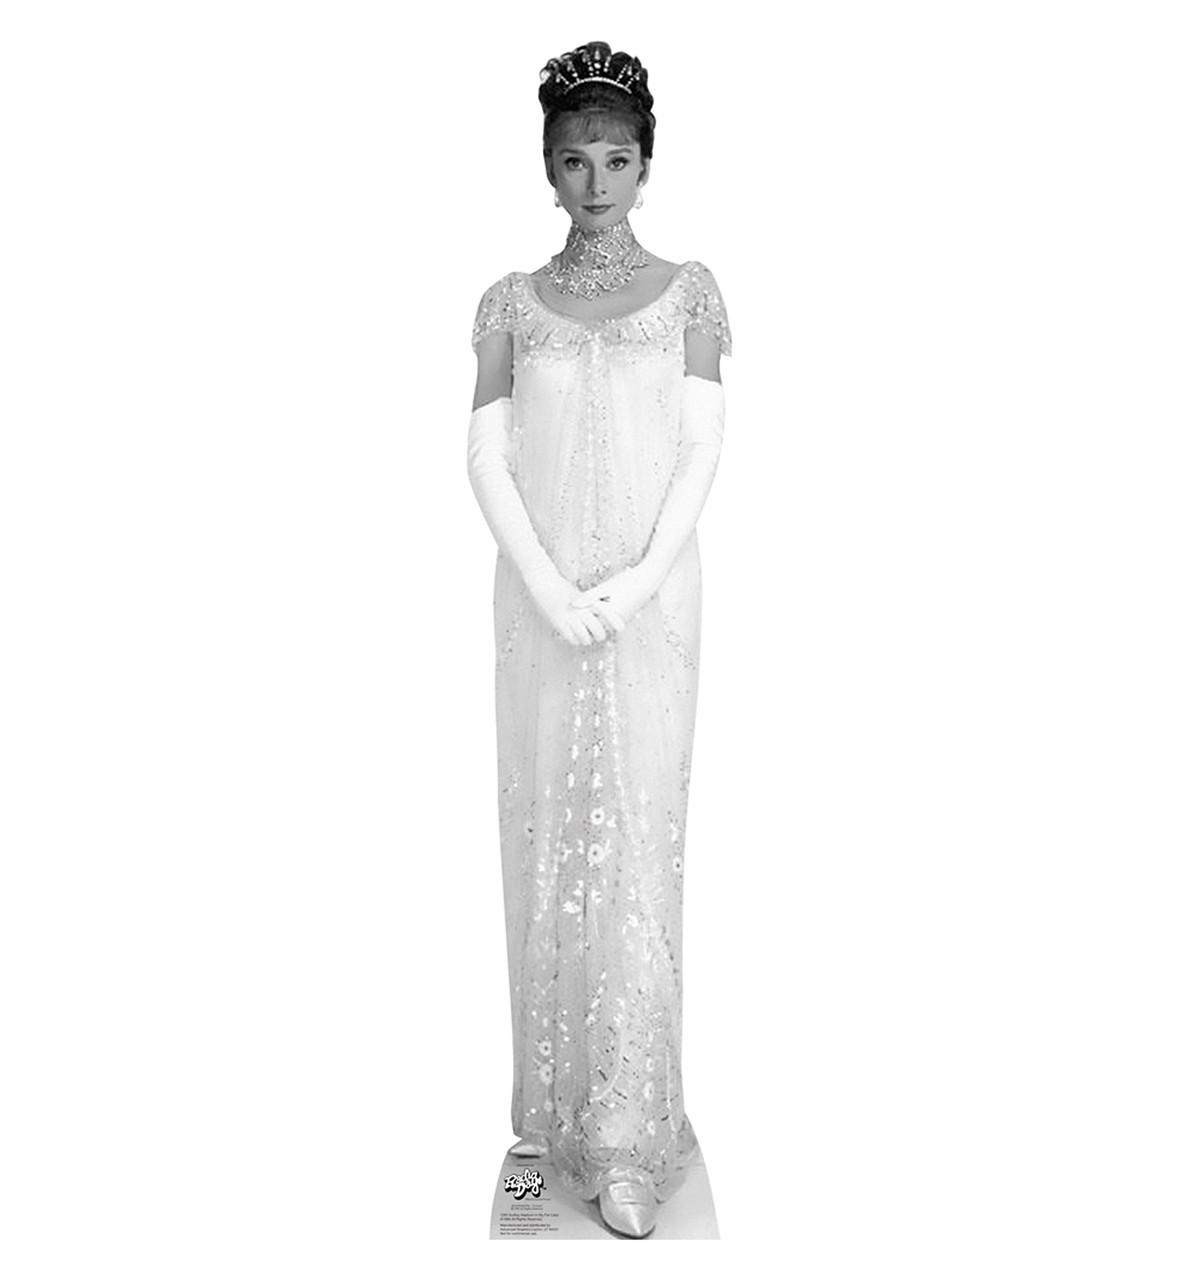 Life-size Audrey Hepburn - My Fair Lady 2 Cardboard Standup ...